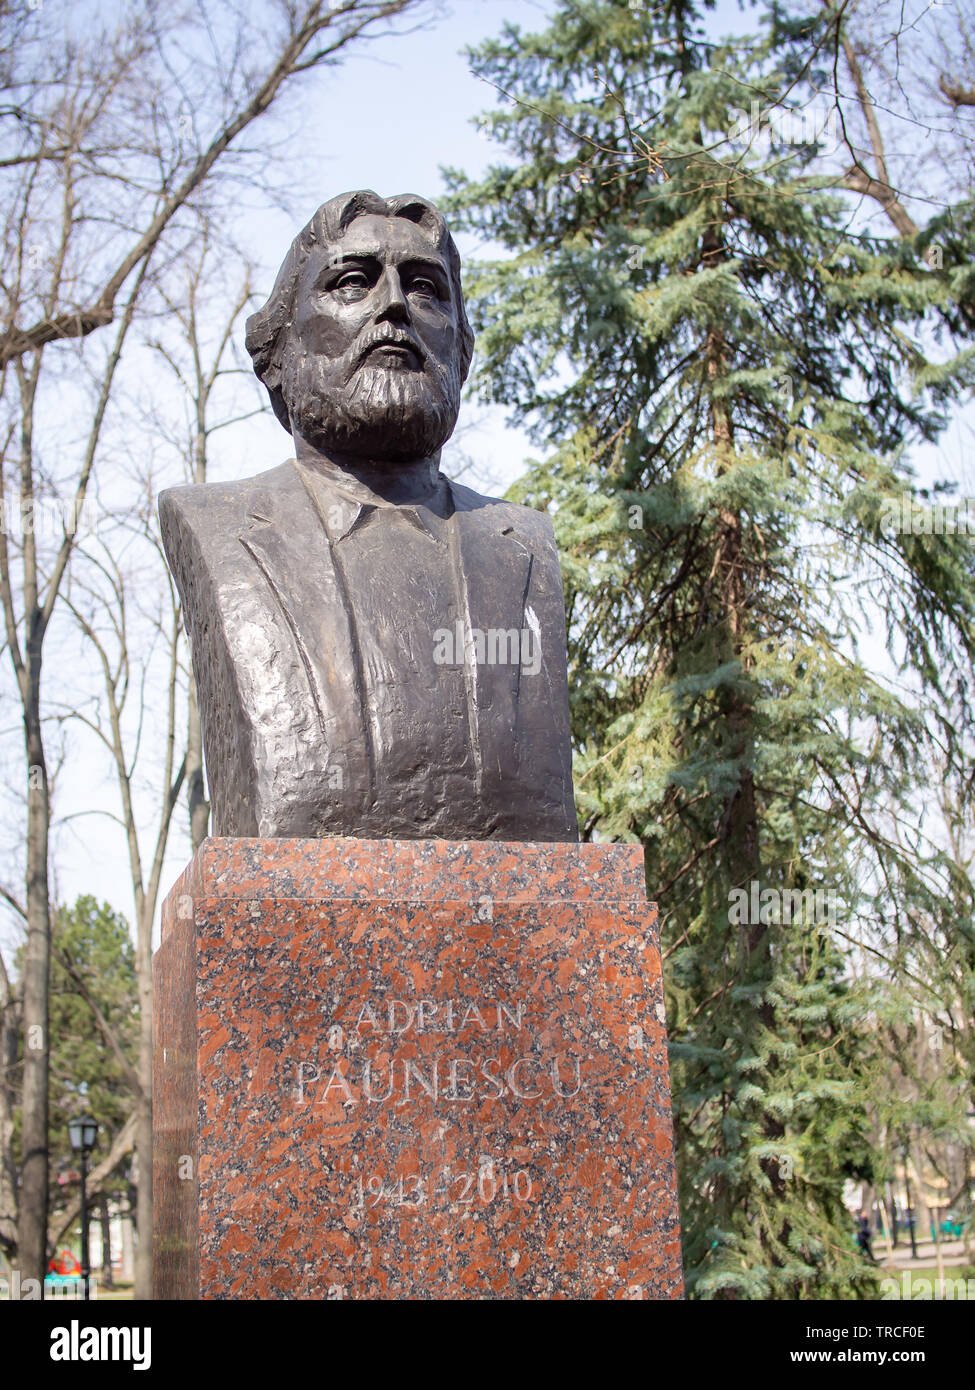 CHISINAU, MOLDOVA-MARCH 21, 2019: Adrian Paunescu bust in the Alley of Classics - Stock Image